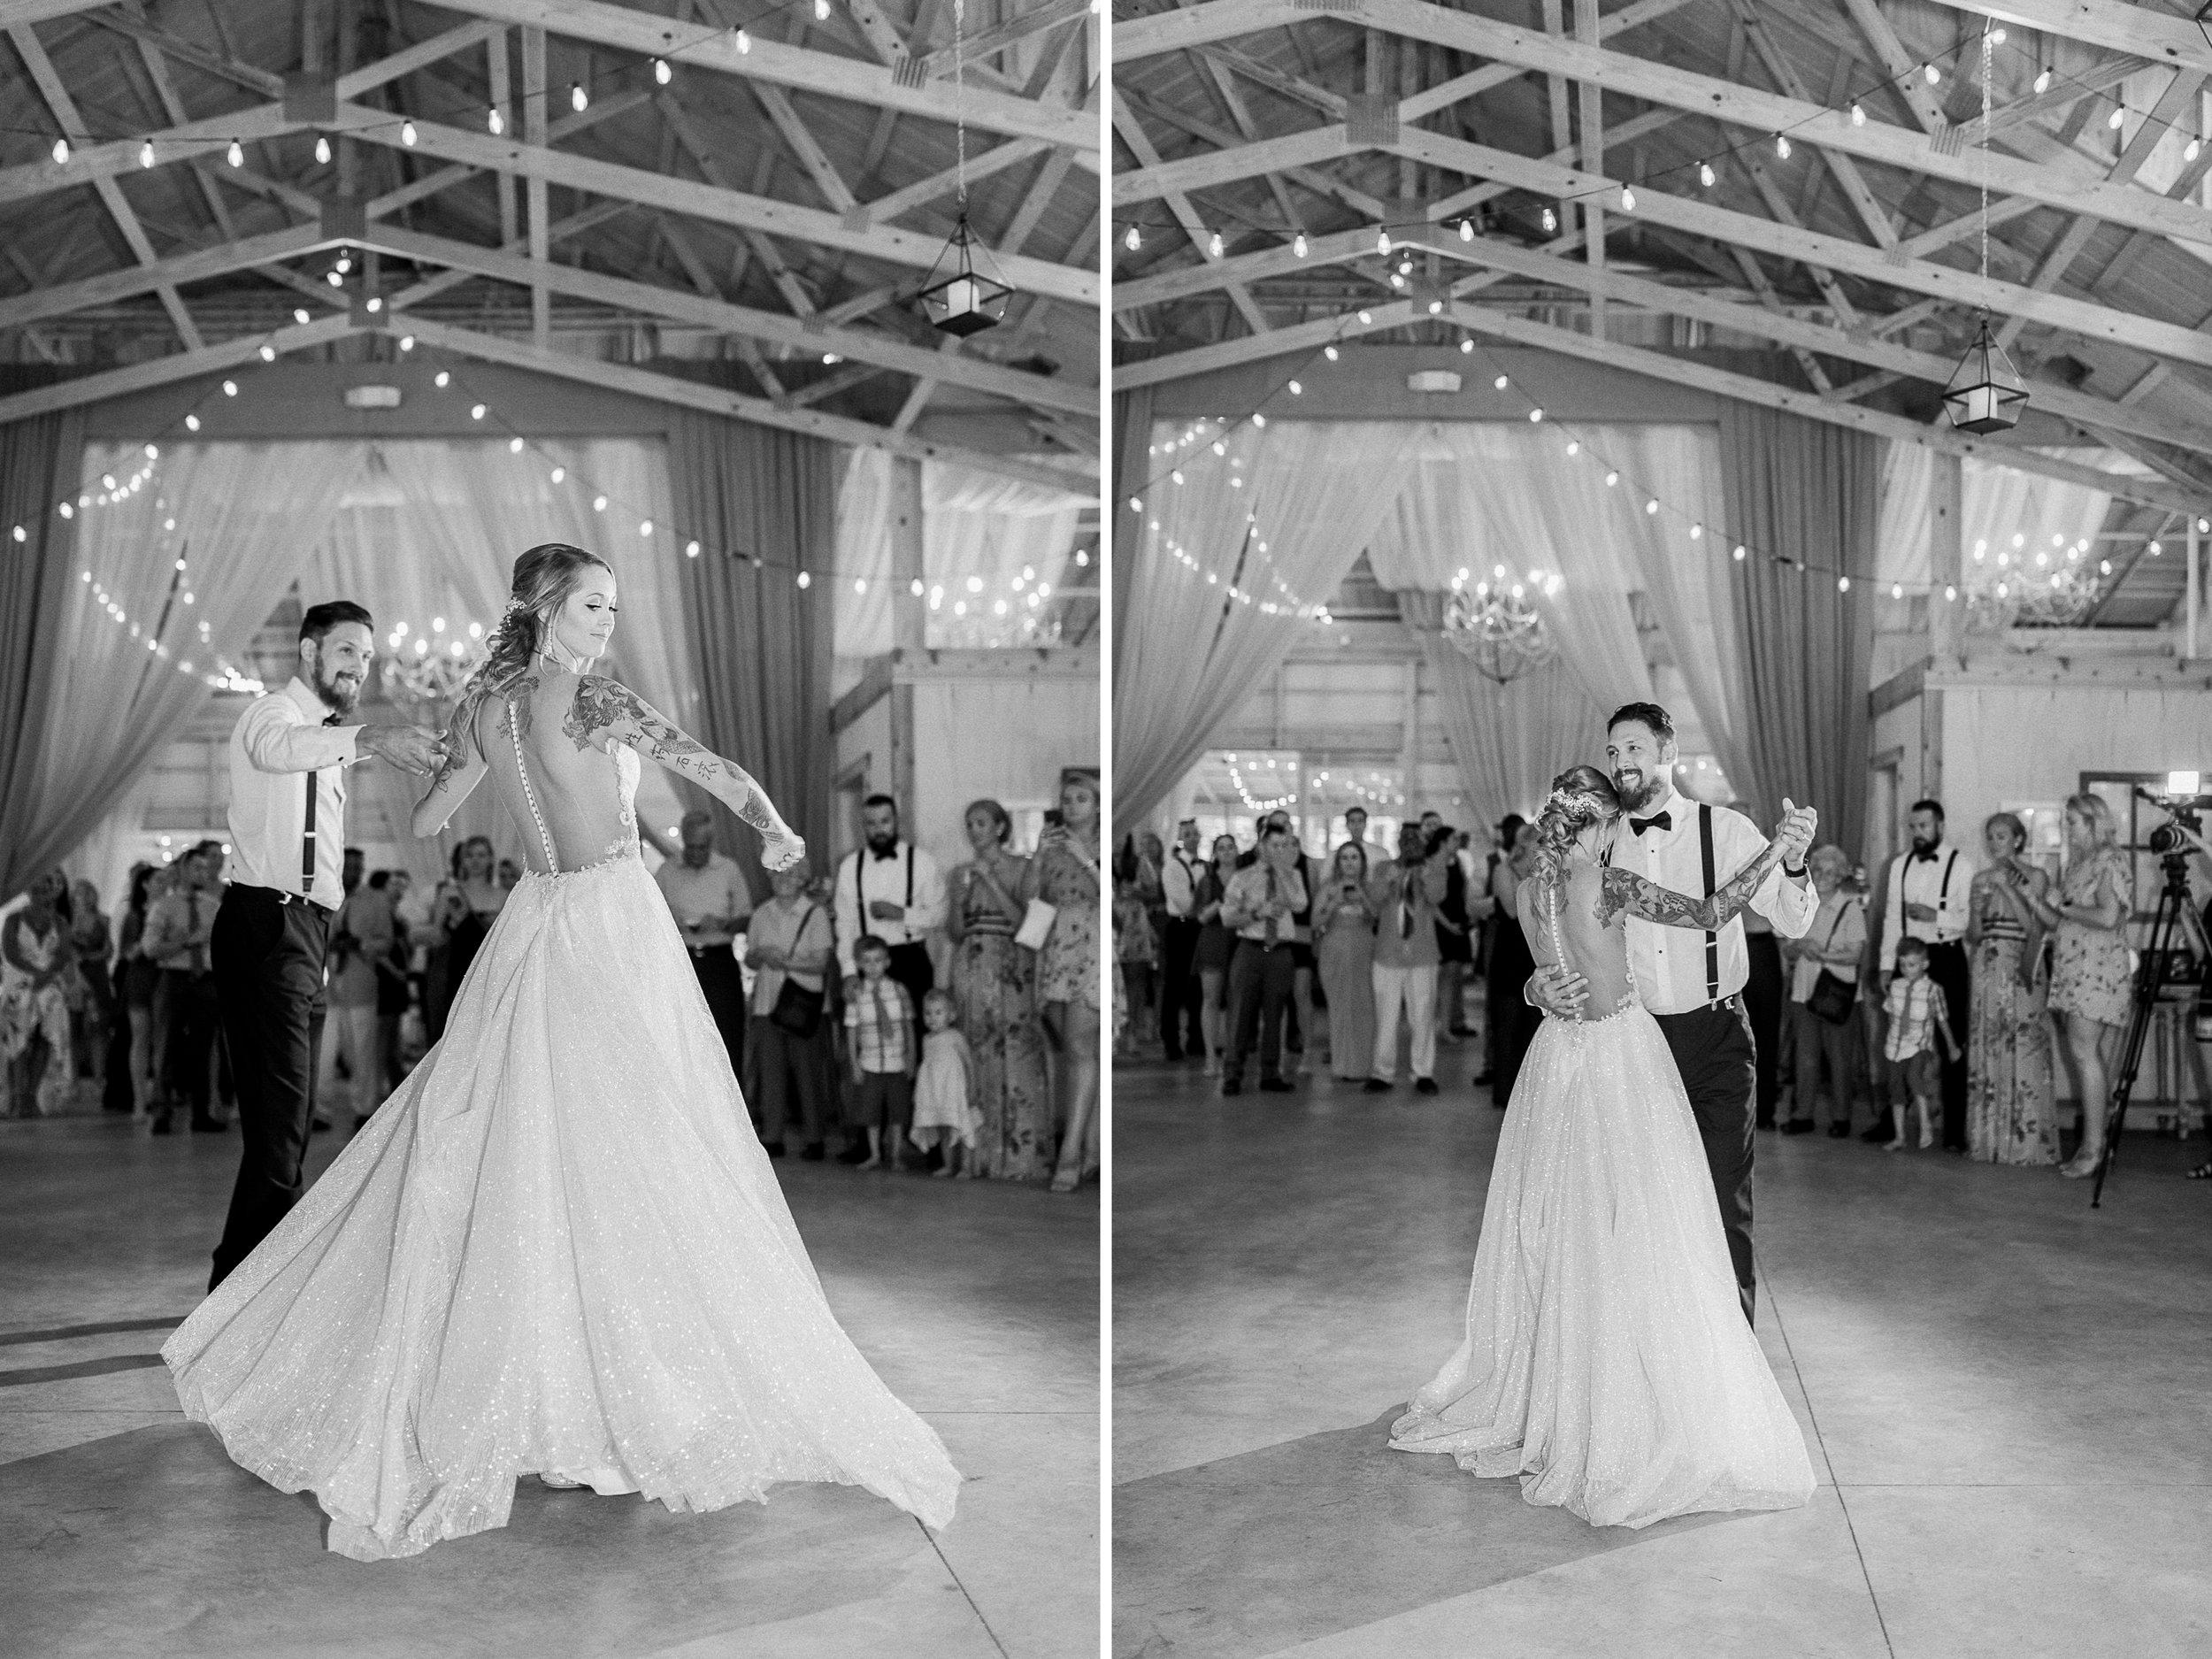 Fairytale Wedding In the Woods | Beauty and the Beast themed Wedding | Barn Wedding Reception | Low Back Wedding Dress | Light & Airy Wedding Photography | West Michigan Wedding Photographer